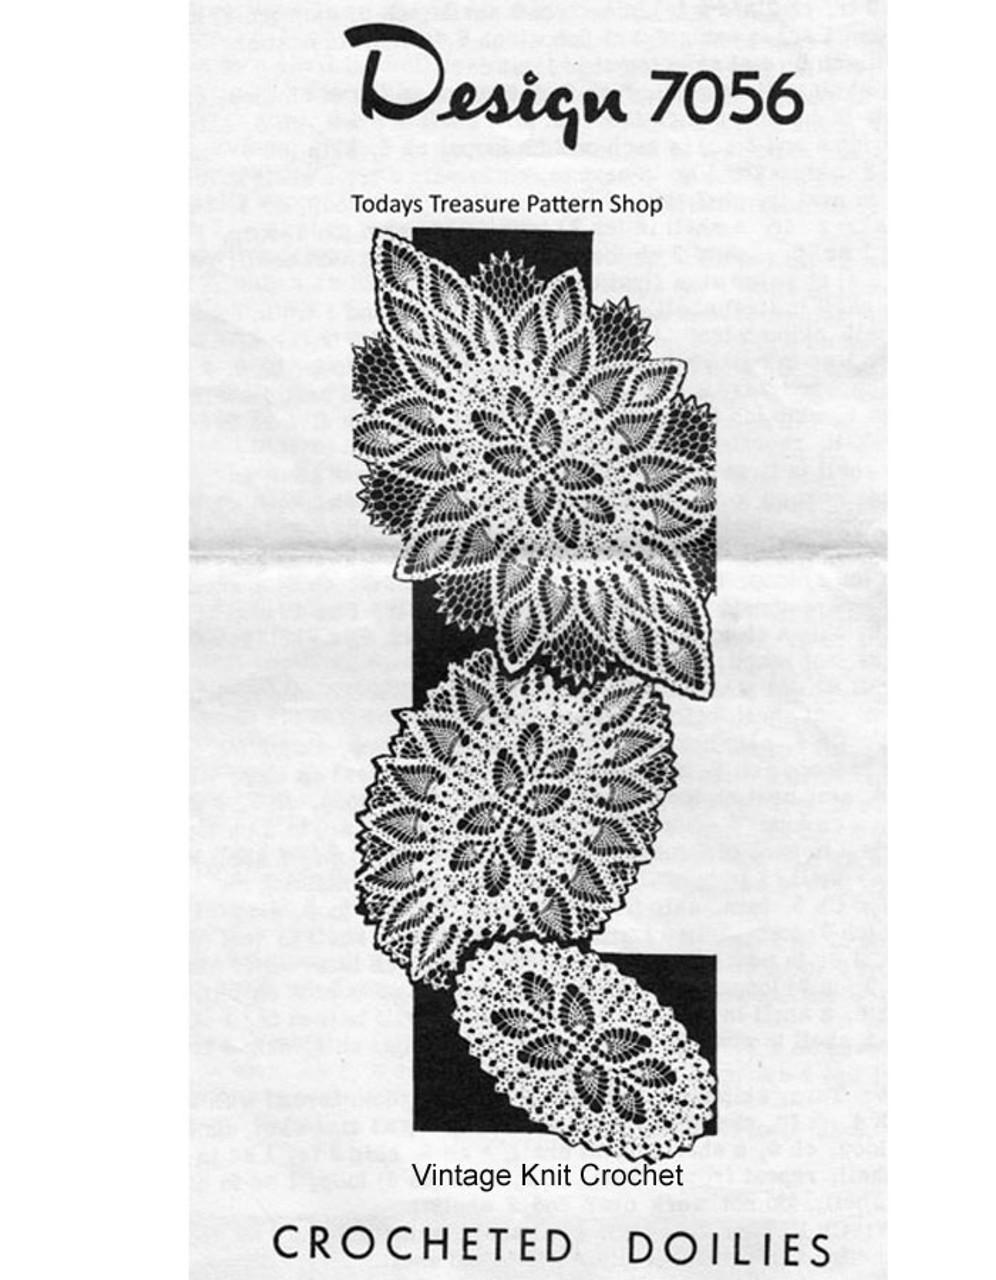 Oval Crochet pineapple doilies pattern Design 7056